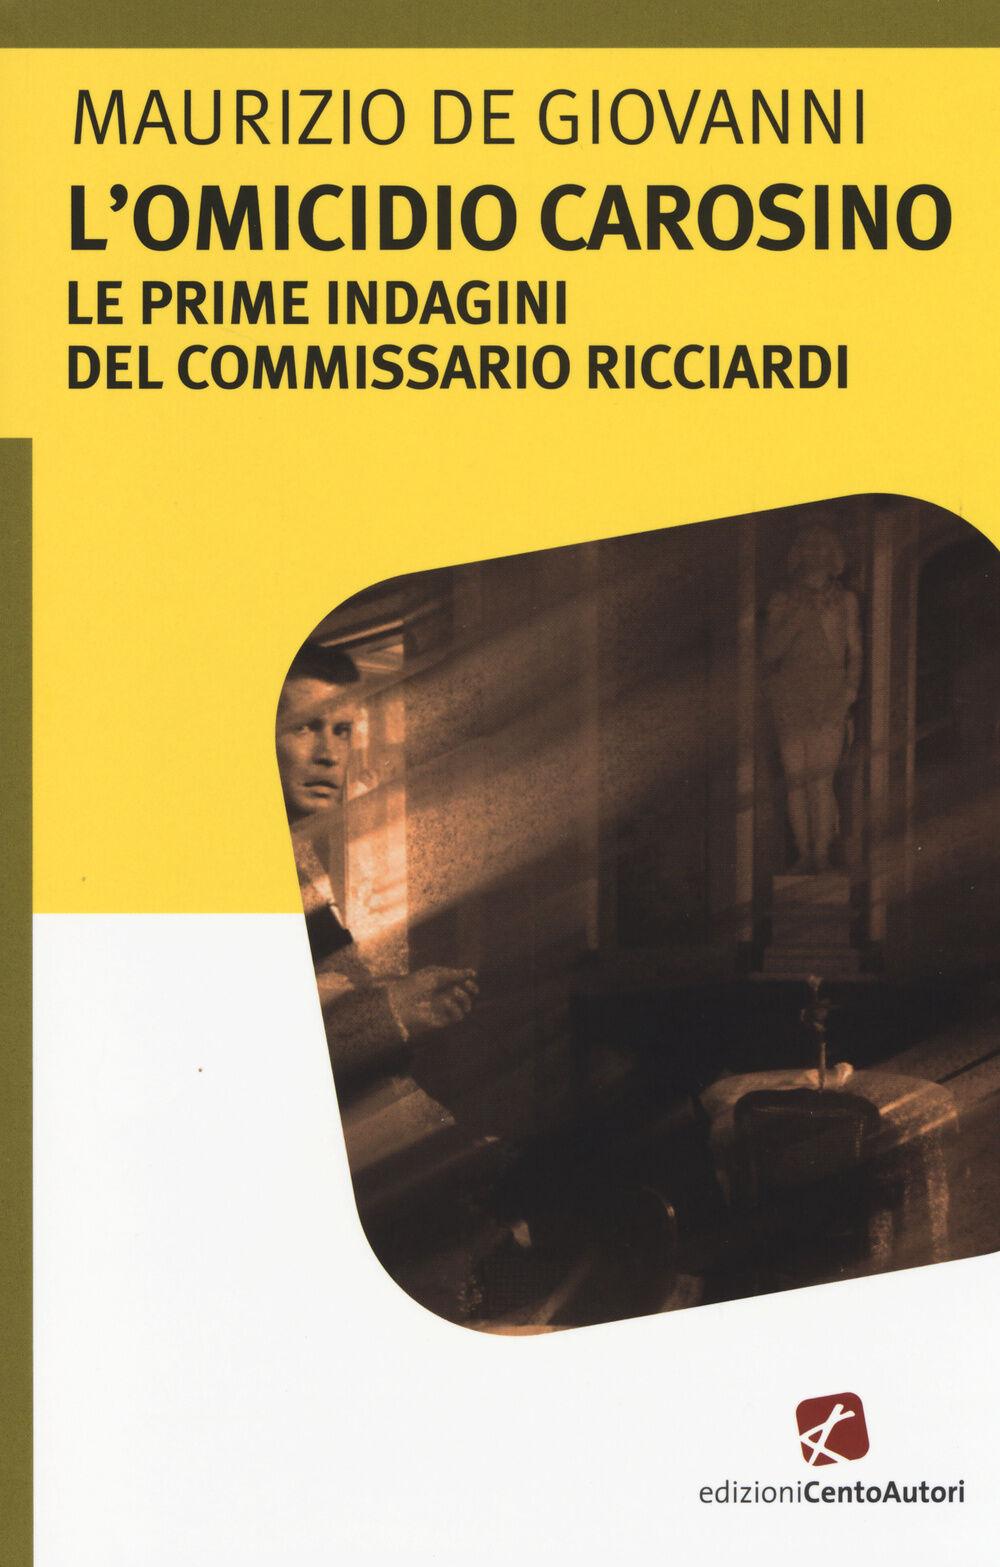 L' omicidio Carosino. Le prime indagini del commissario Ricciardi